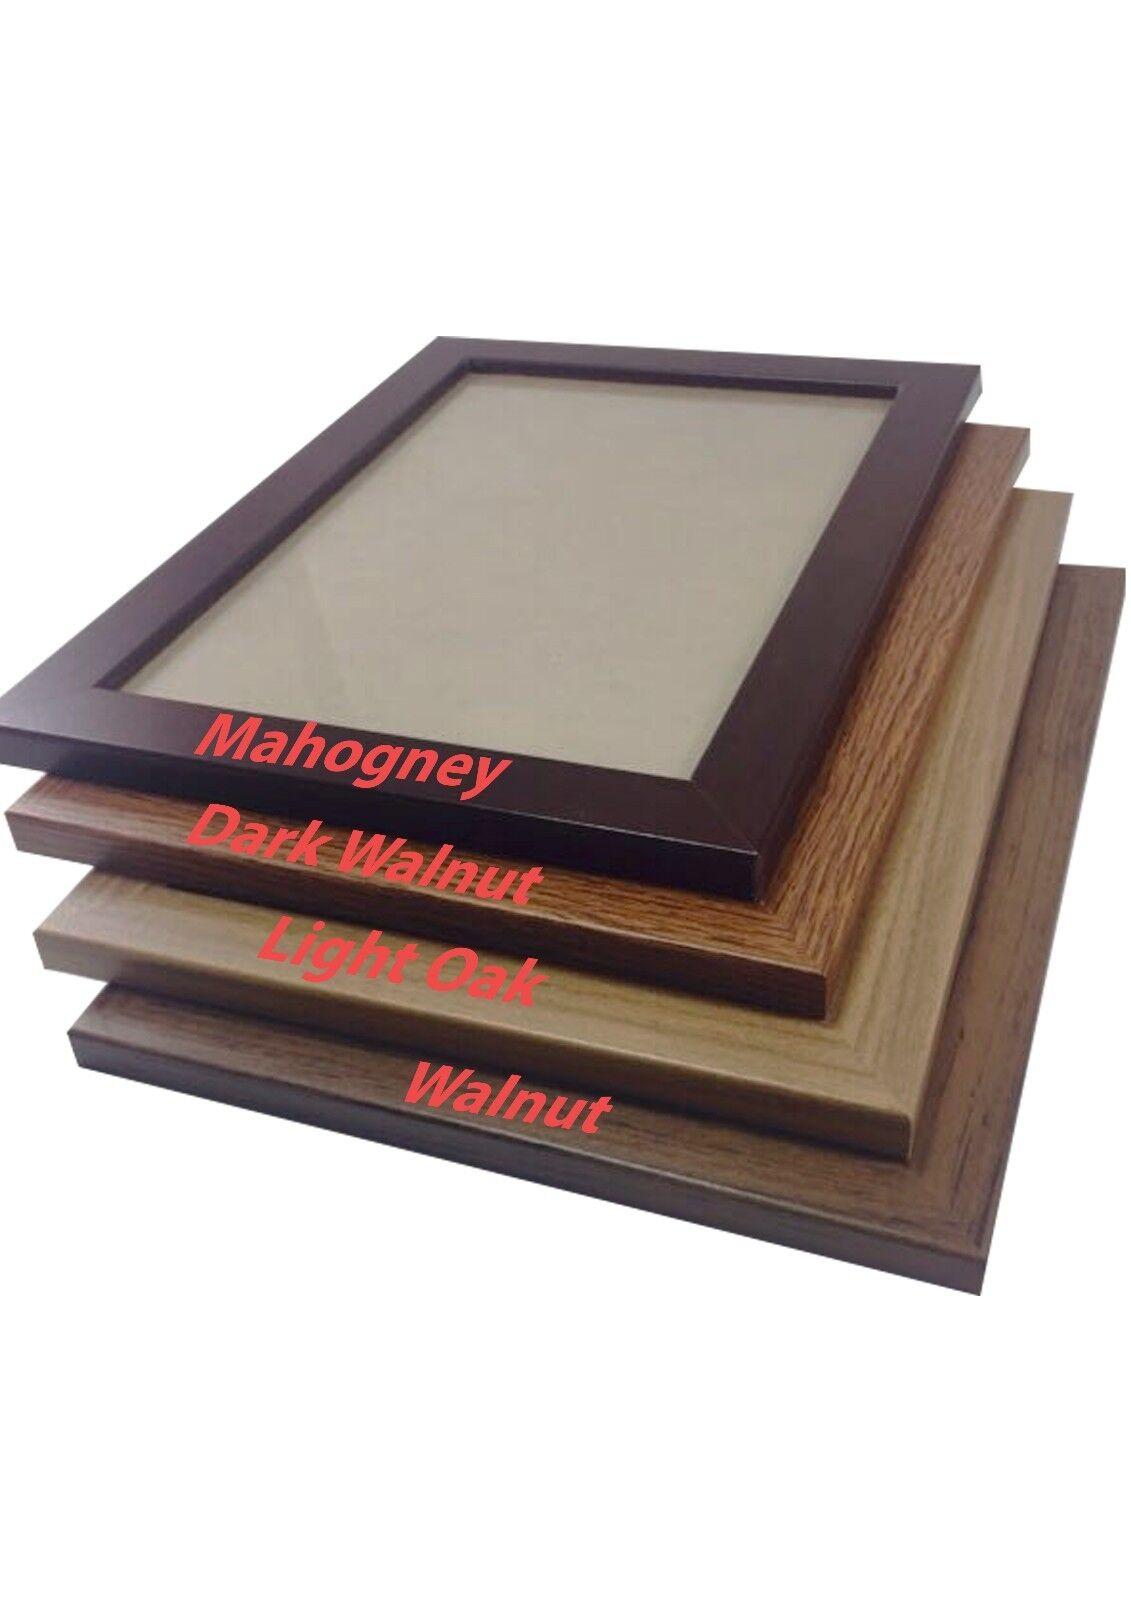 Poster Frame, Photo Frames ,Modern Picture Frame in Wood Eff